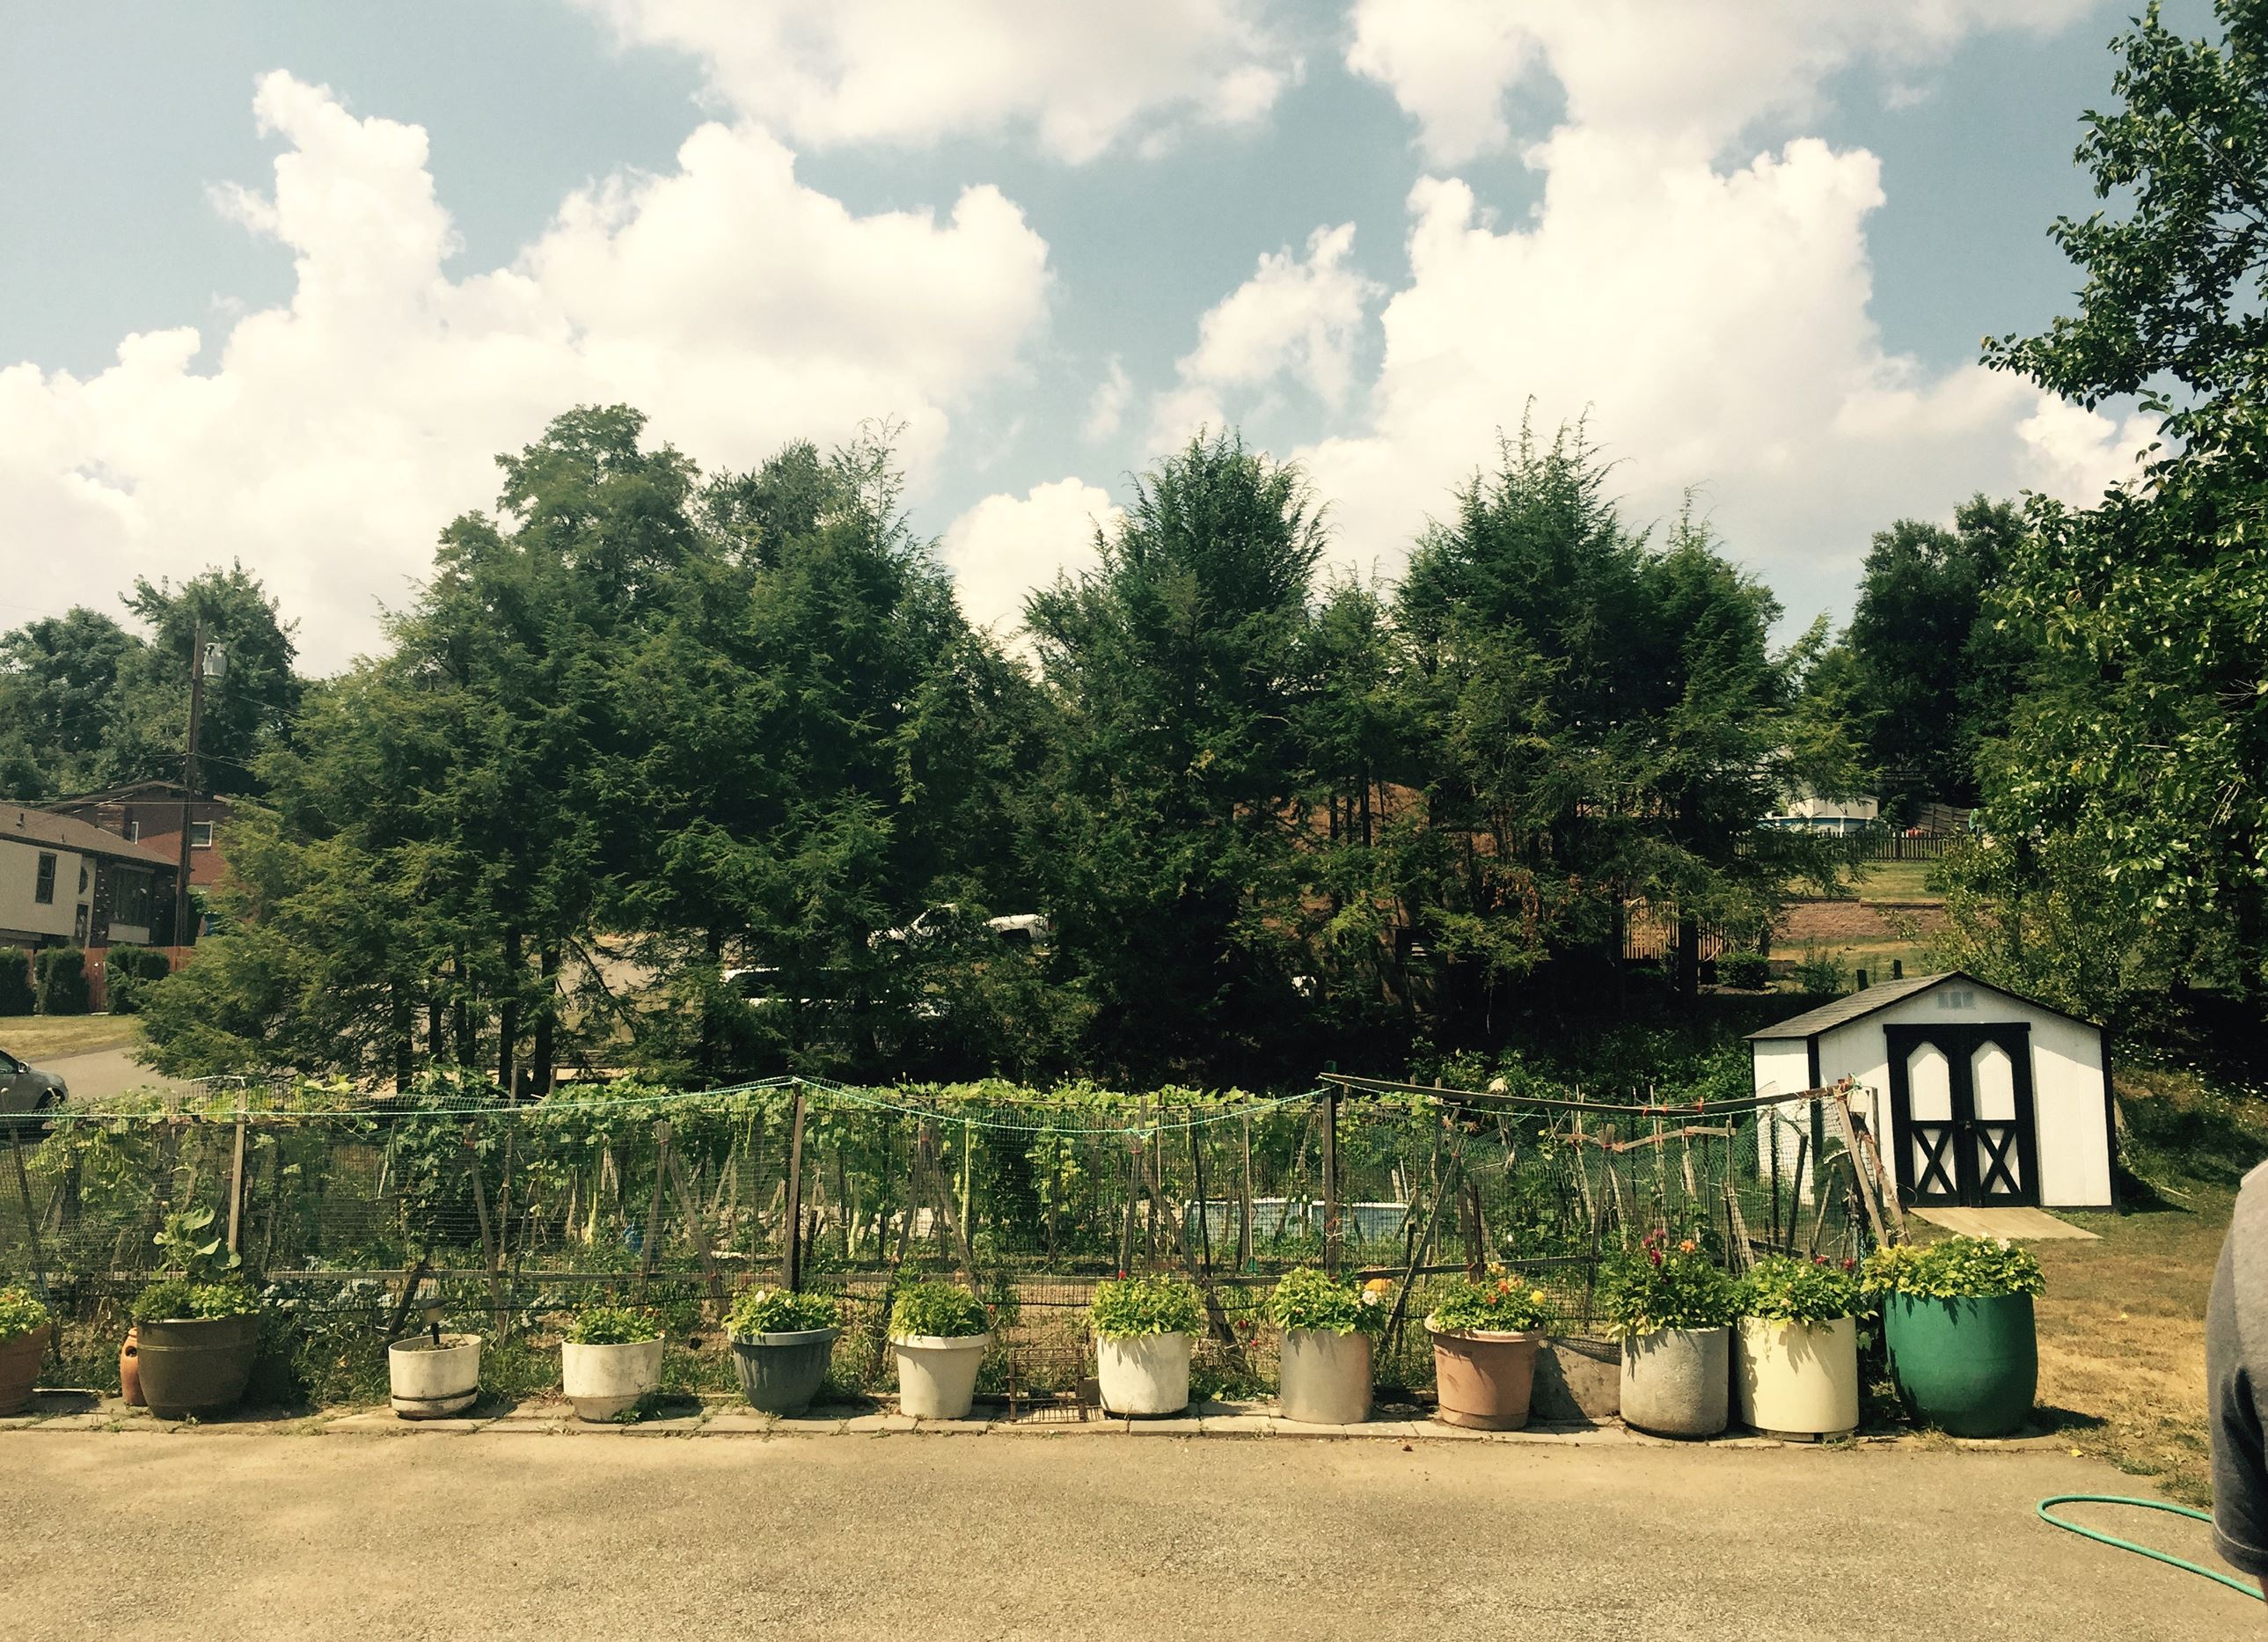 ItaliangardenF-5 Antonio Manti's garden in Shaler.